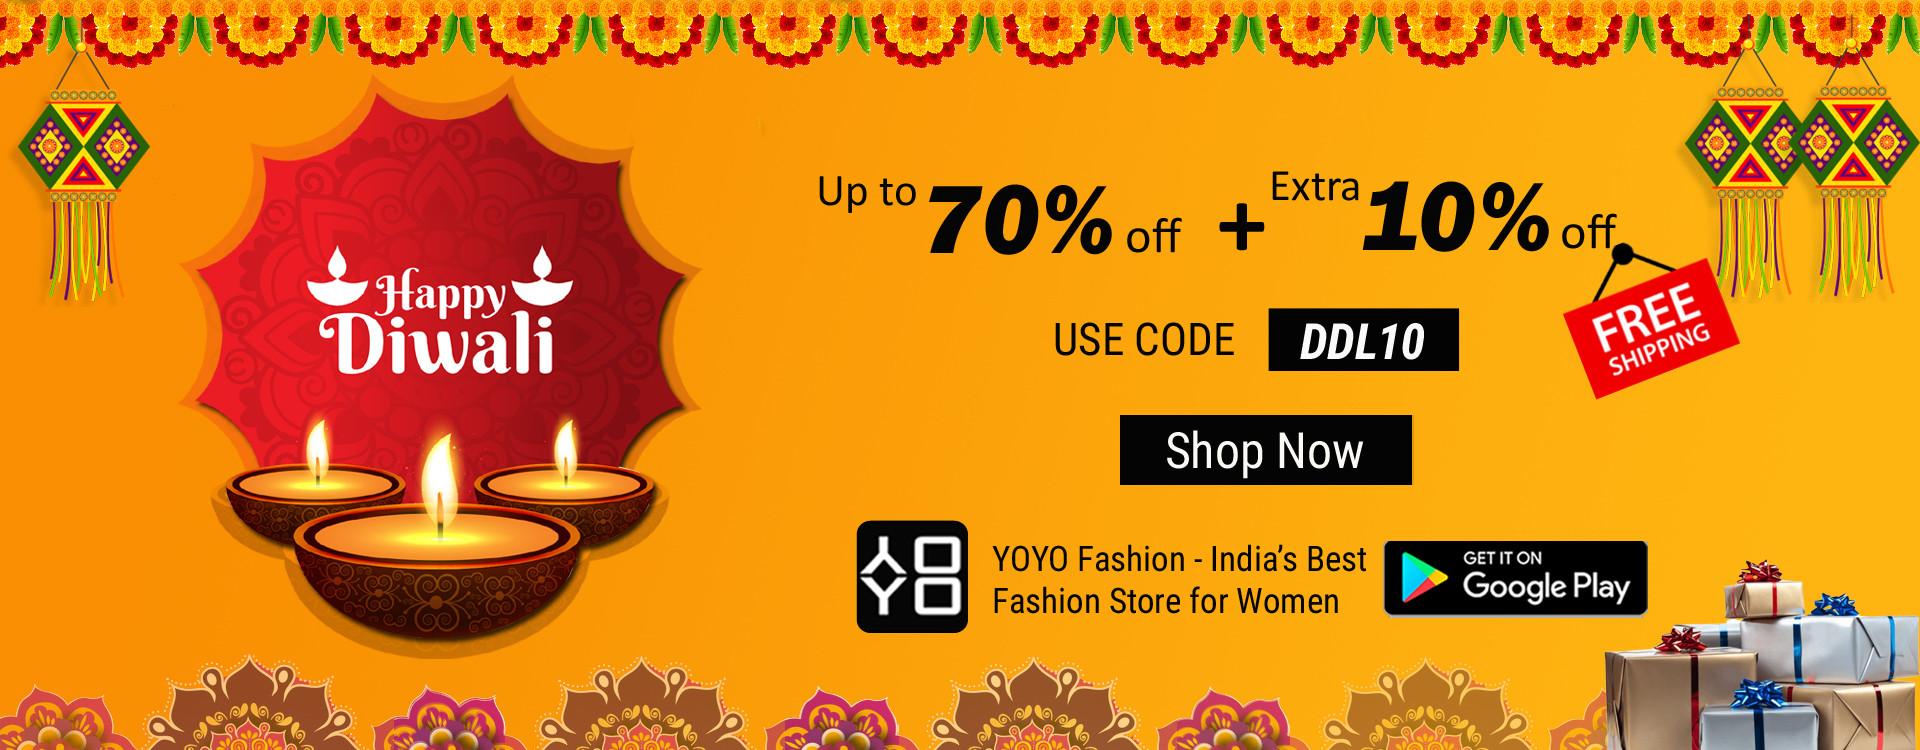 Diwali Offers- Diwali Dresses Sarees Collection Online - YOYO Fashion